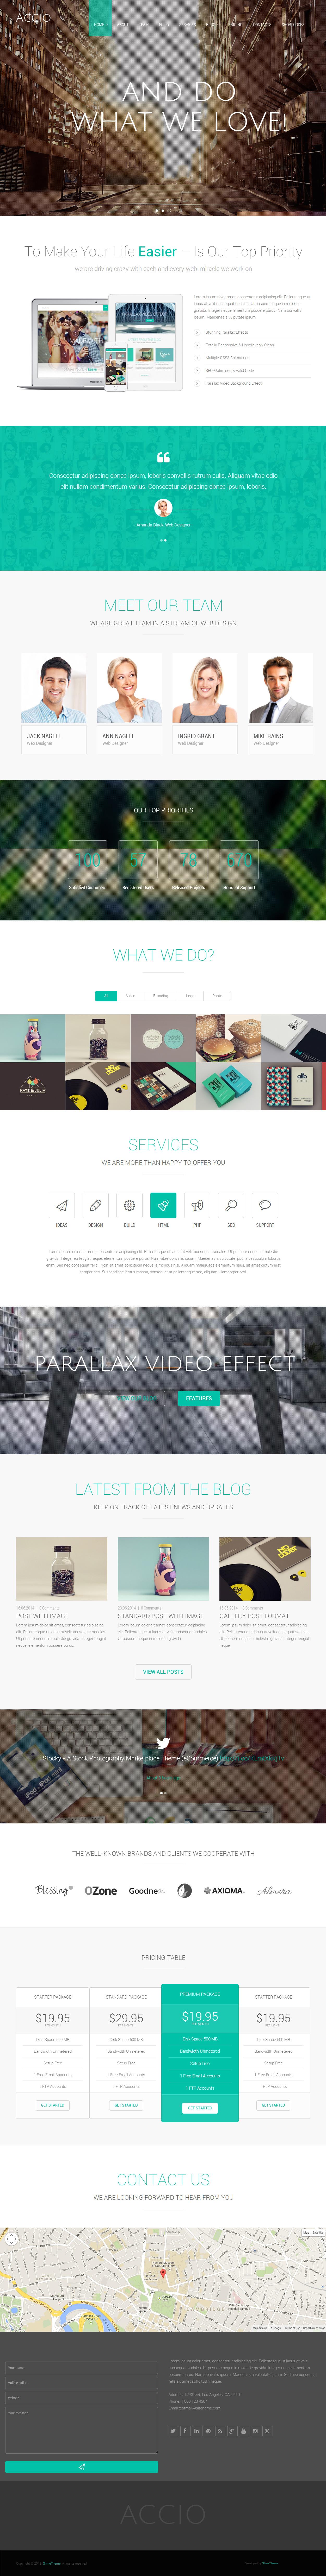 Accio - Premium Responsive One Page Parallax Joomla Template | Video ...